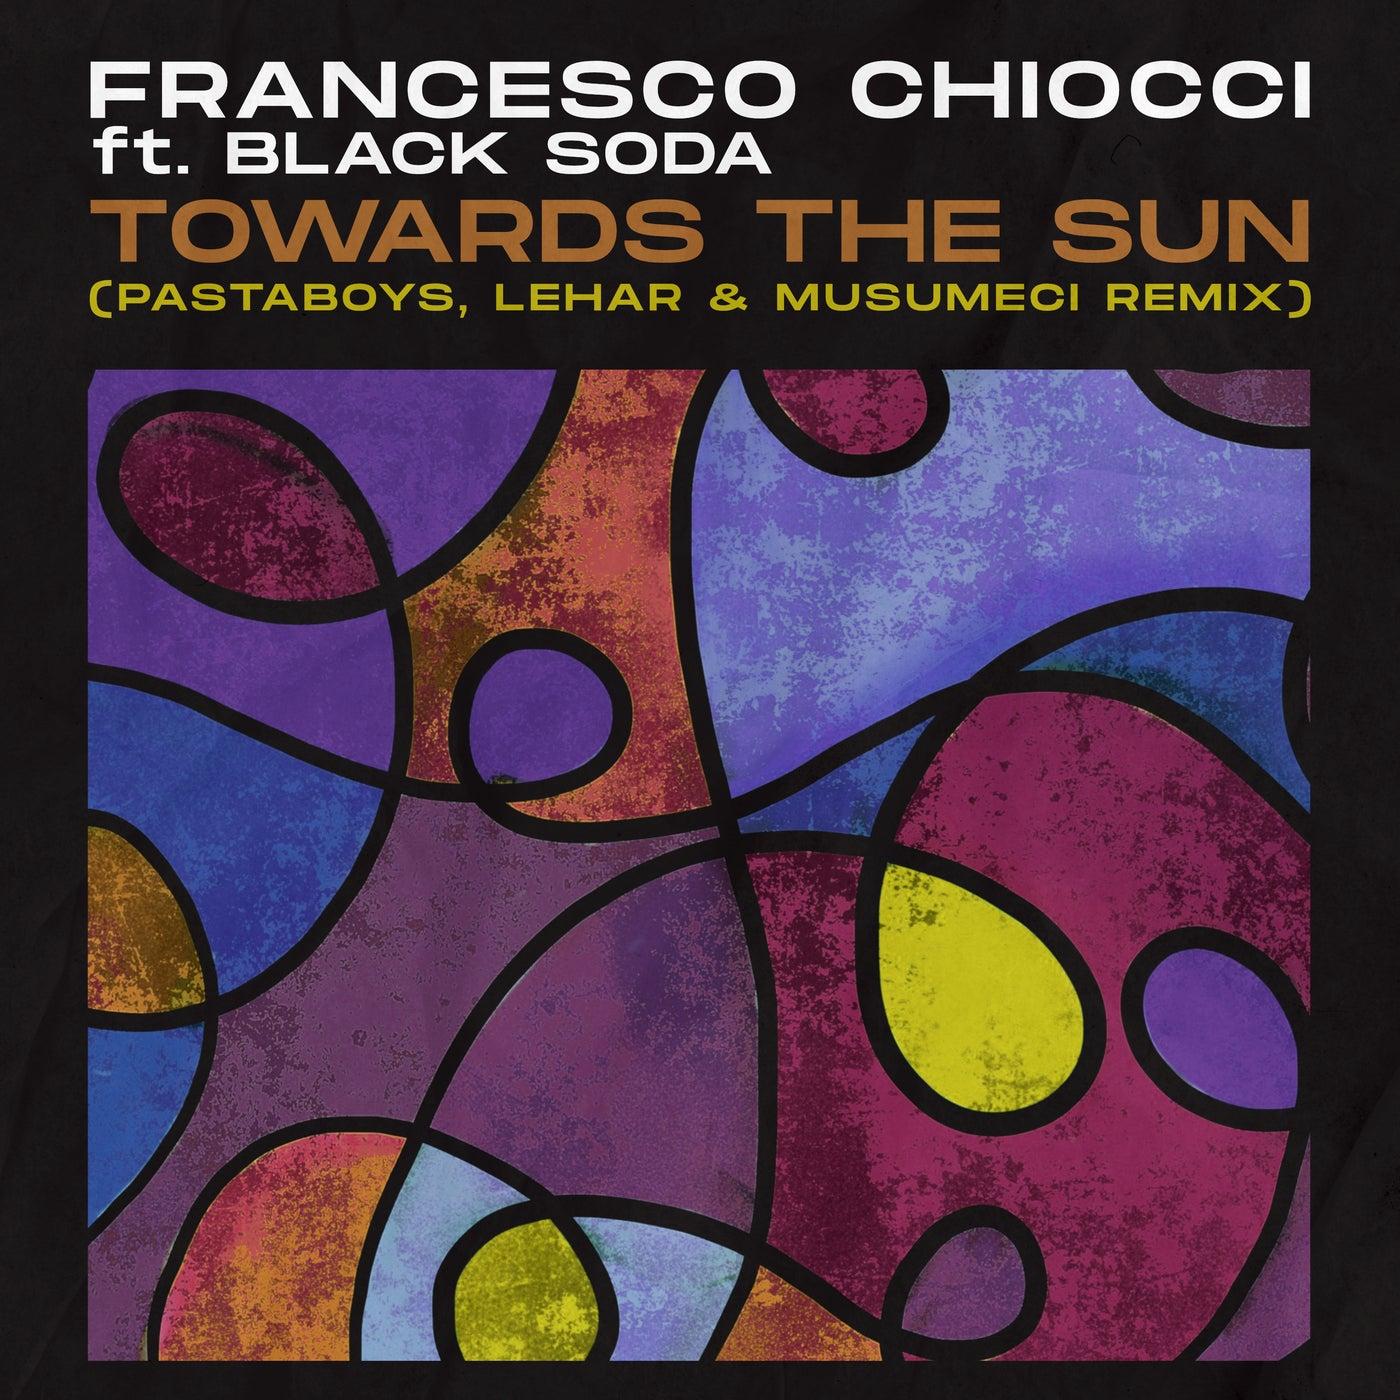 Towards The Sun feat. Black Soda (Pastaboys Remix)